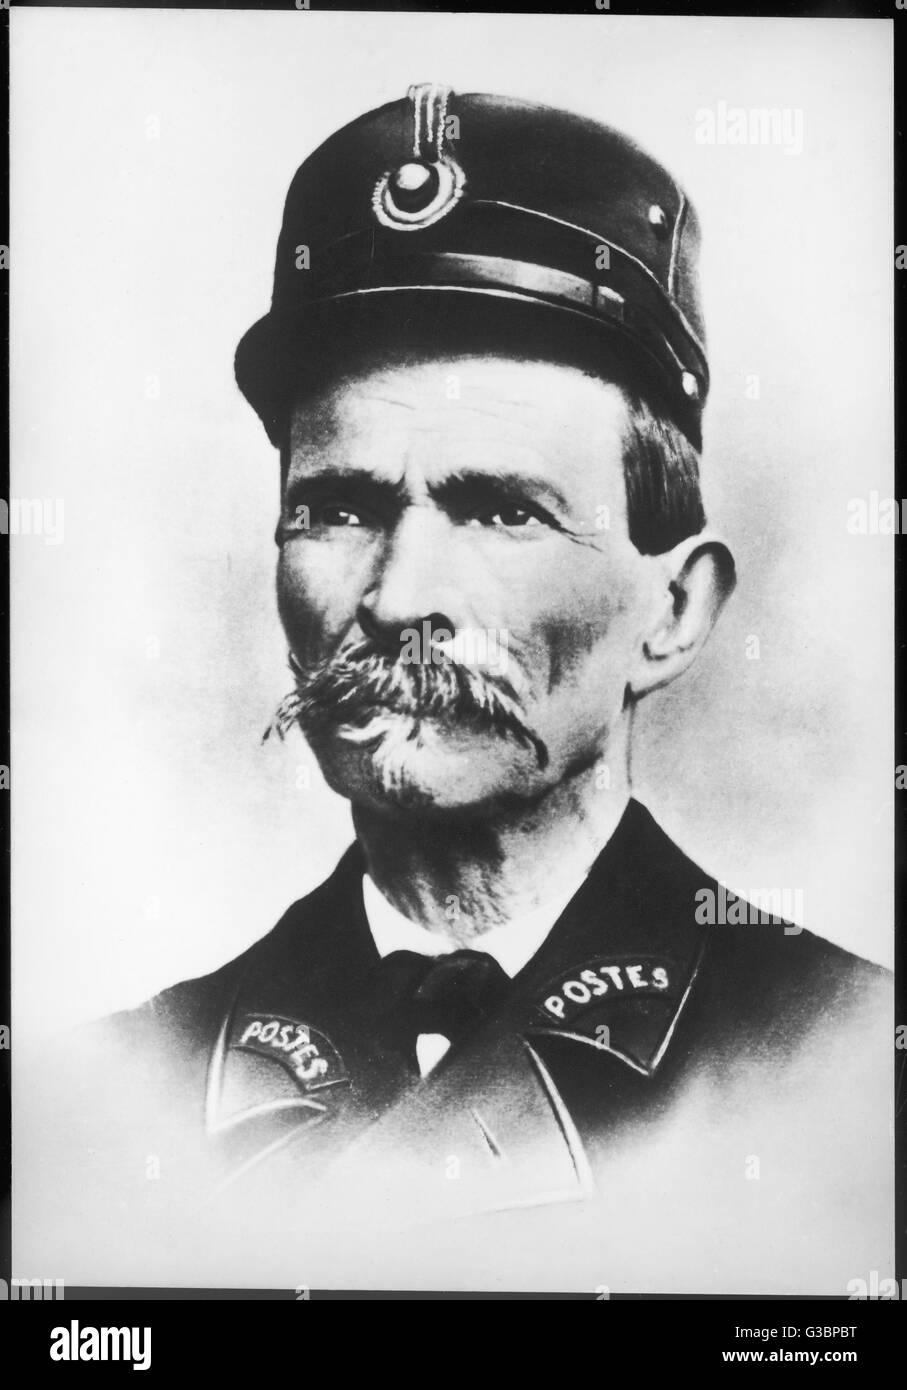 FERDINAND CHEVAL postier rural fantastique et architecte. Date: 1836-1924 Photo Stock